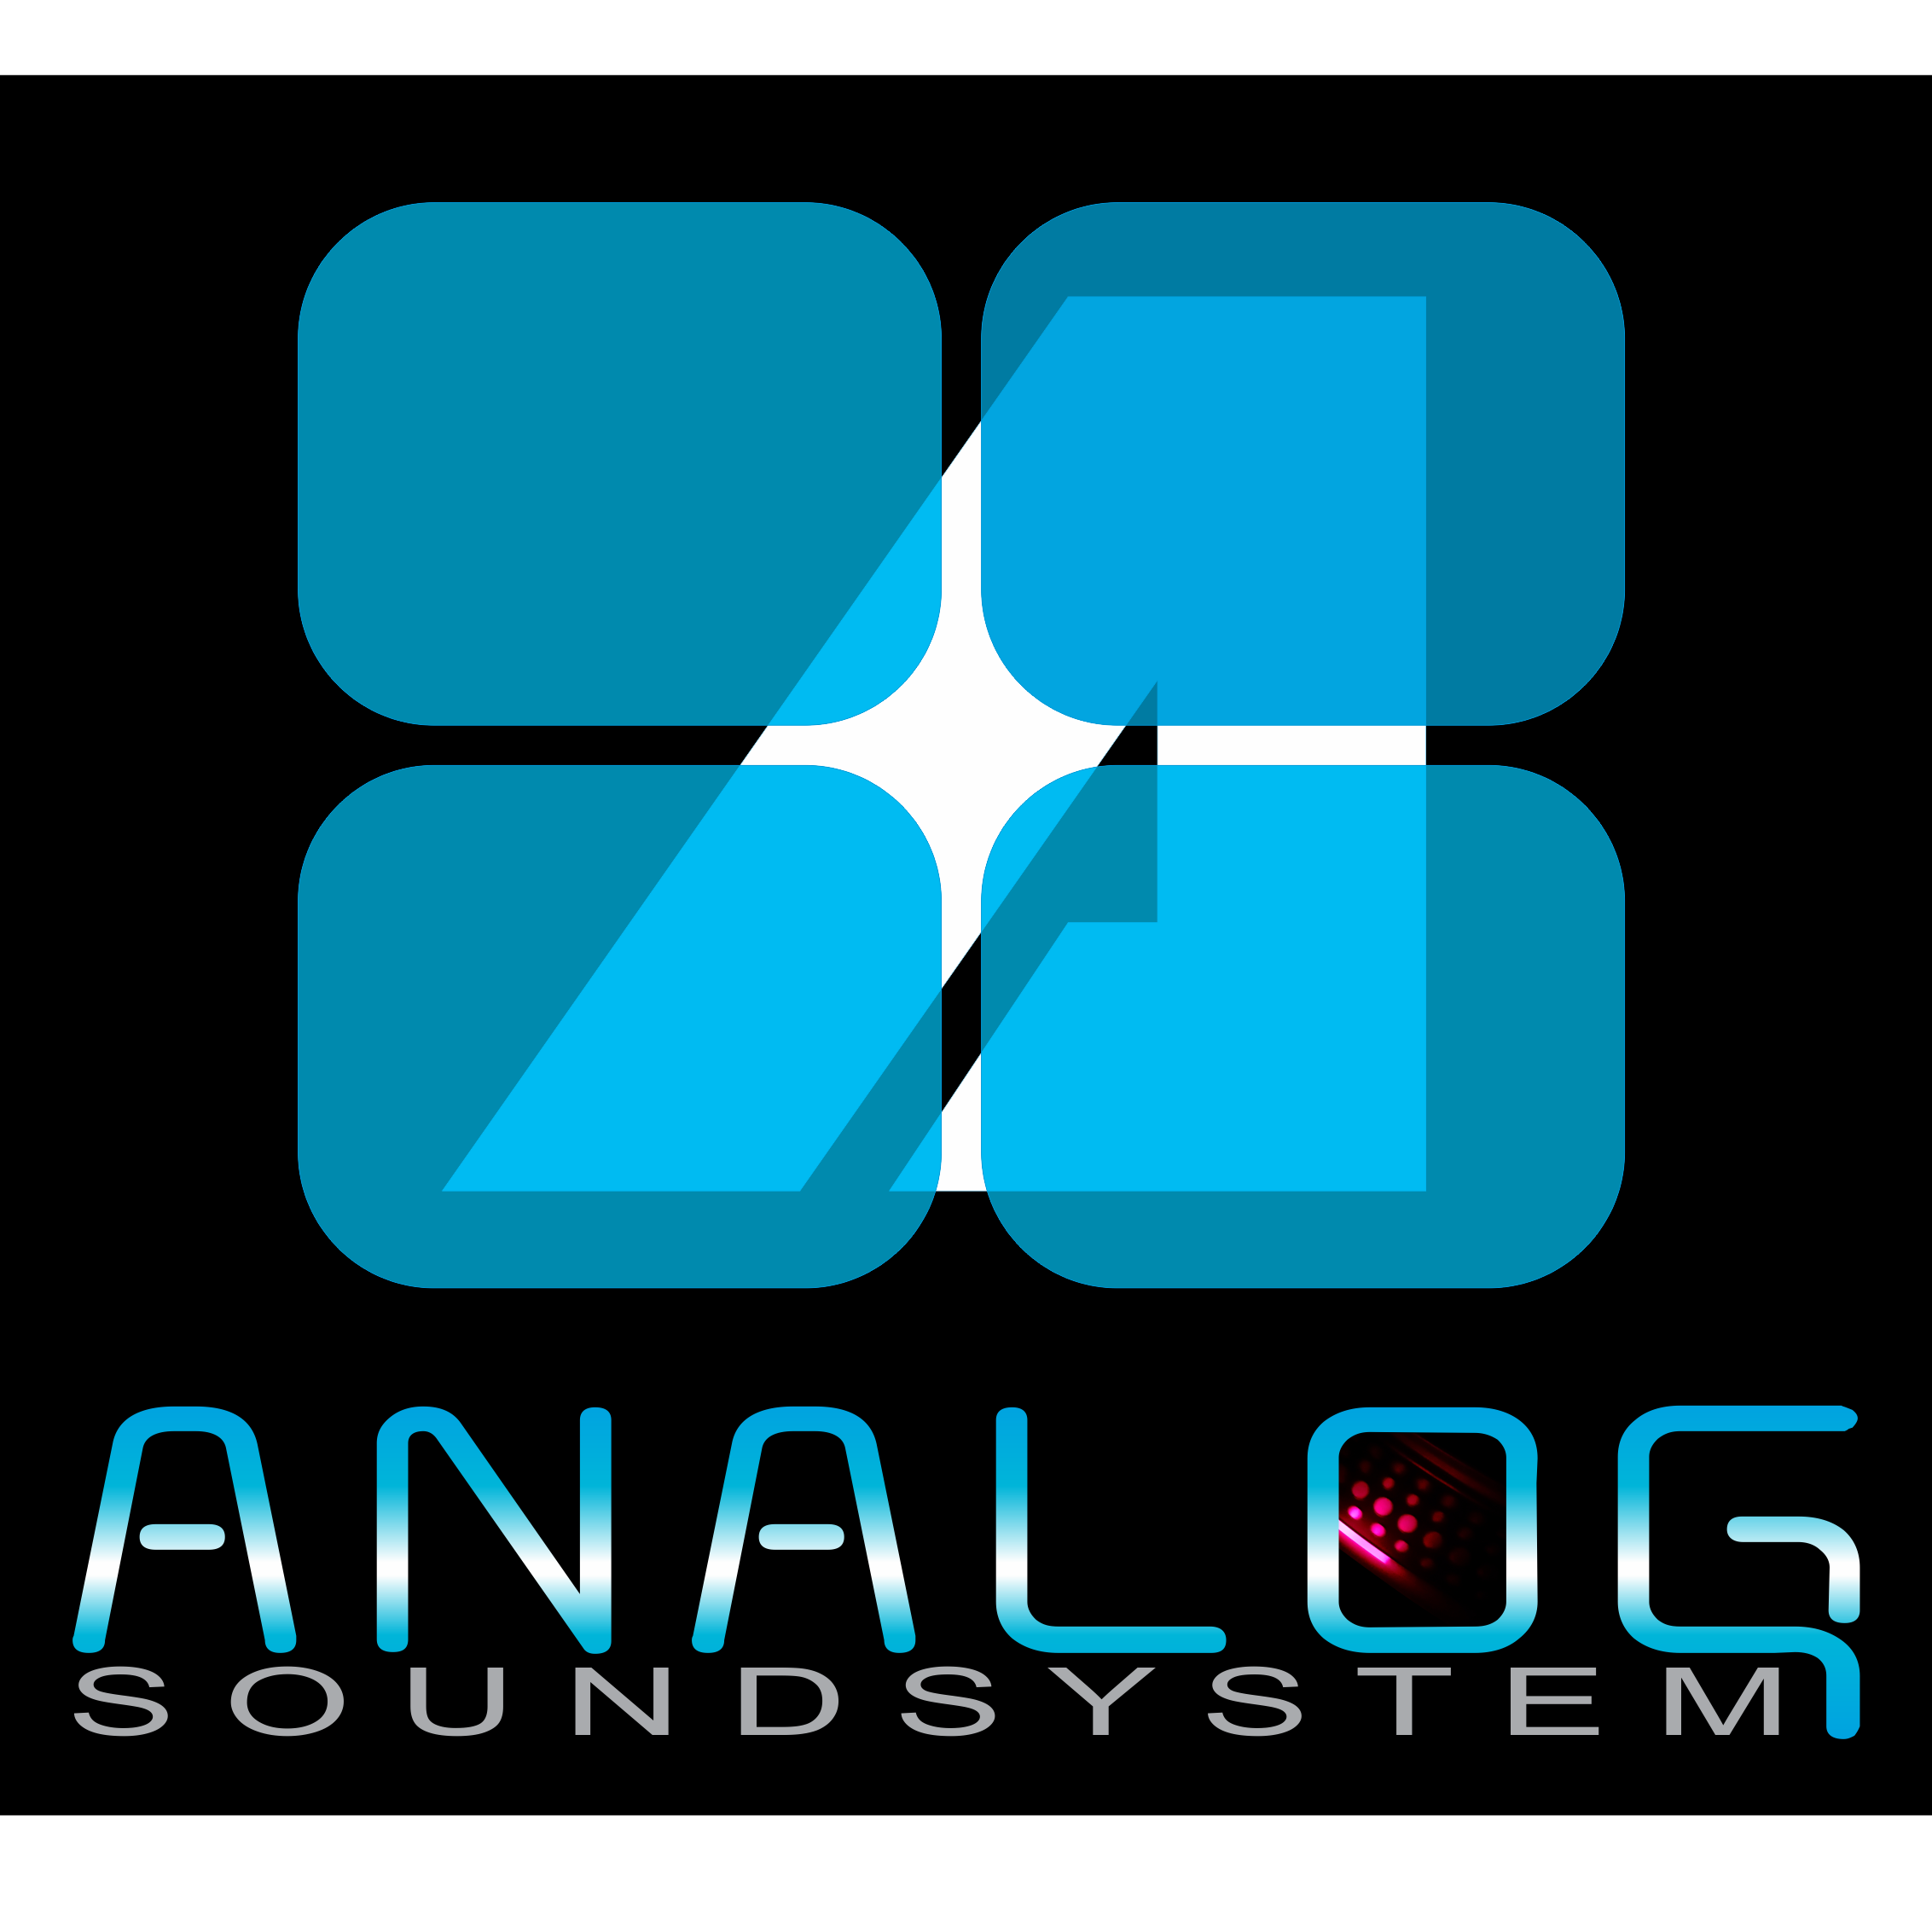 Analog Soundsystem ((( LIVE ))) Raw and Uncut